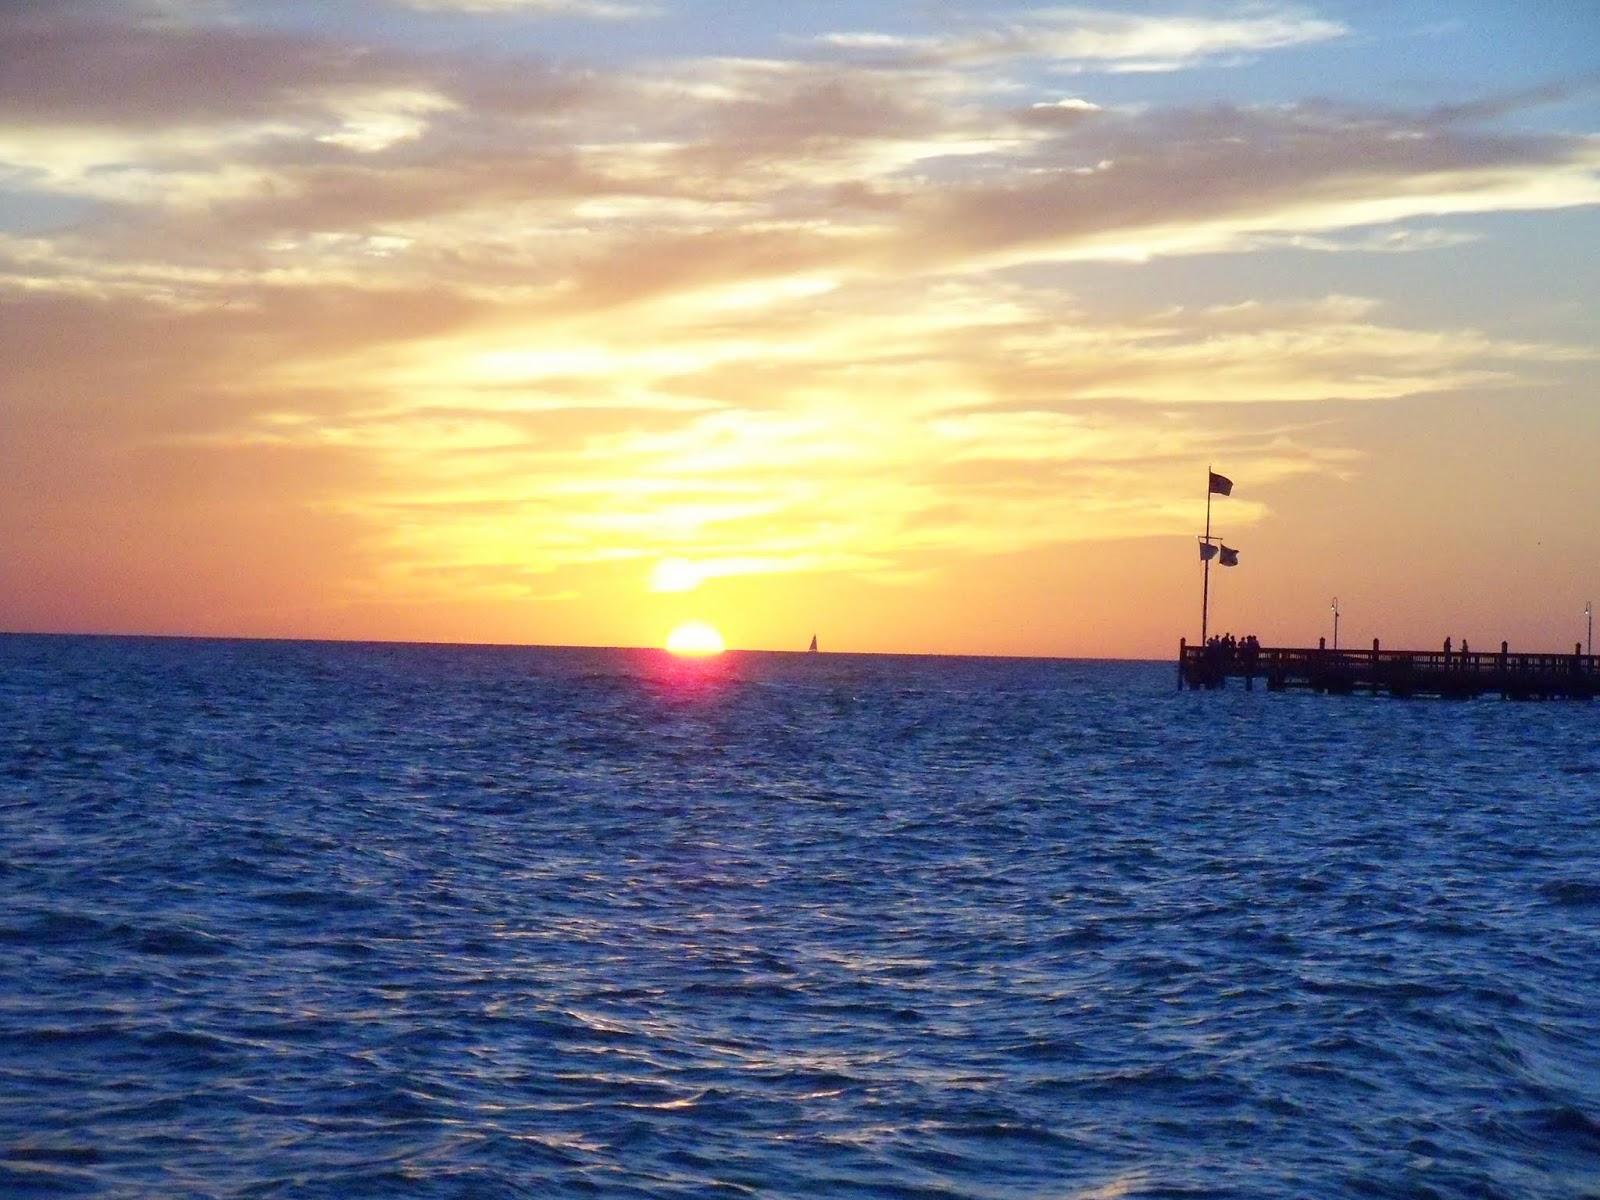 Key West Vacation - 116_5604.JPG